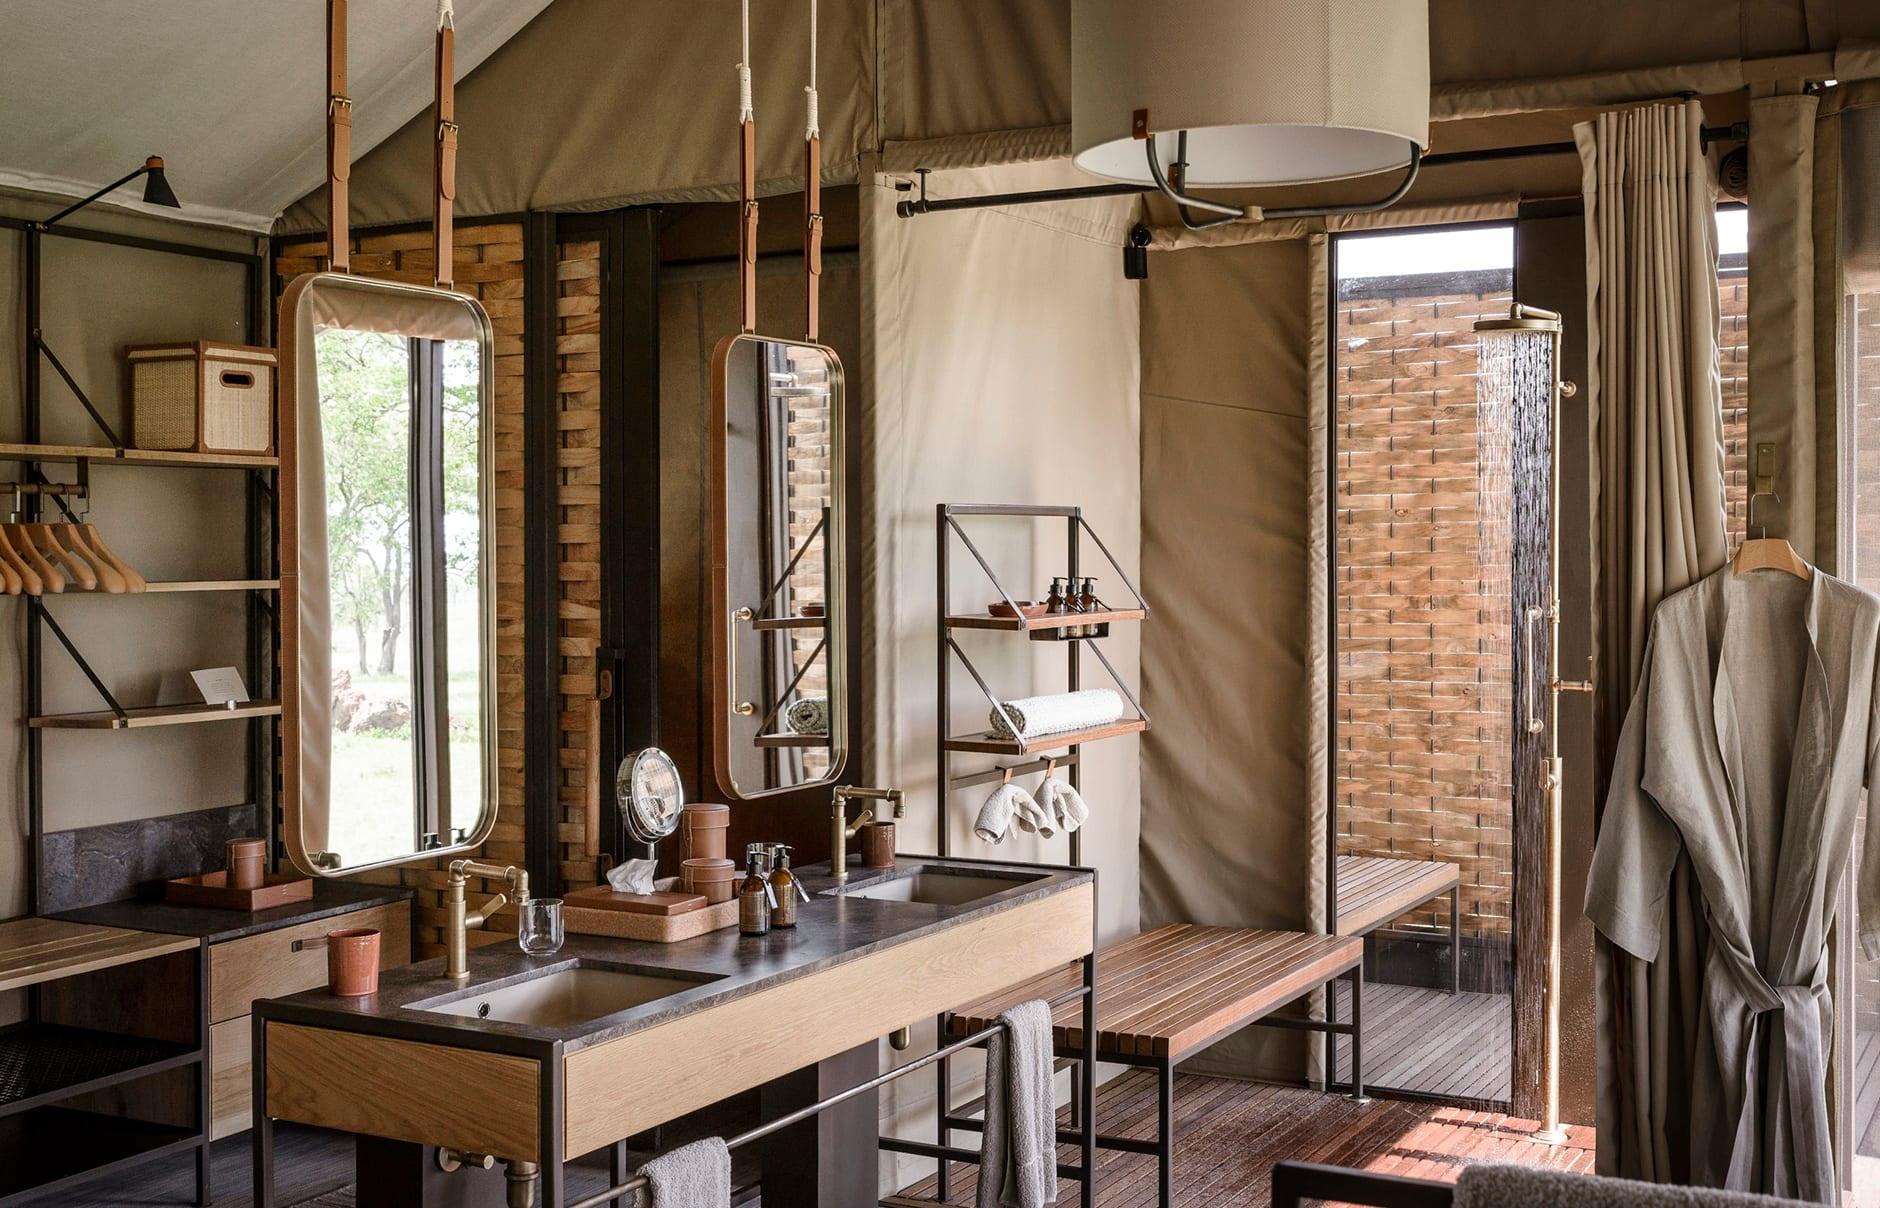 Singita Sabora Tented Camp - Grumeti Serengeti, Tanzania. Hotel Review by TravelPlusStyle. Photo © Singita